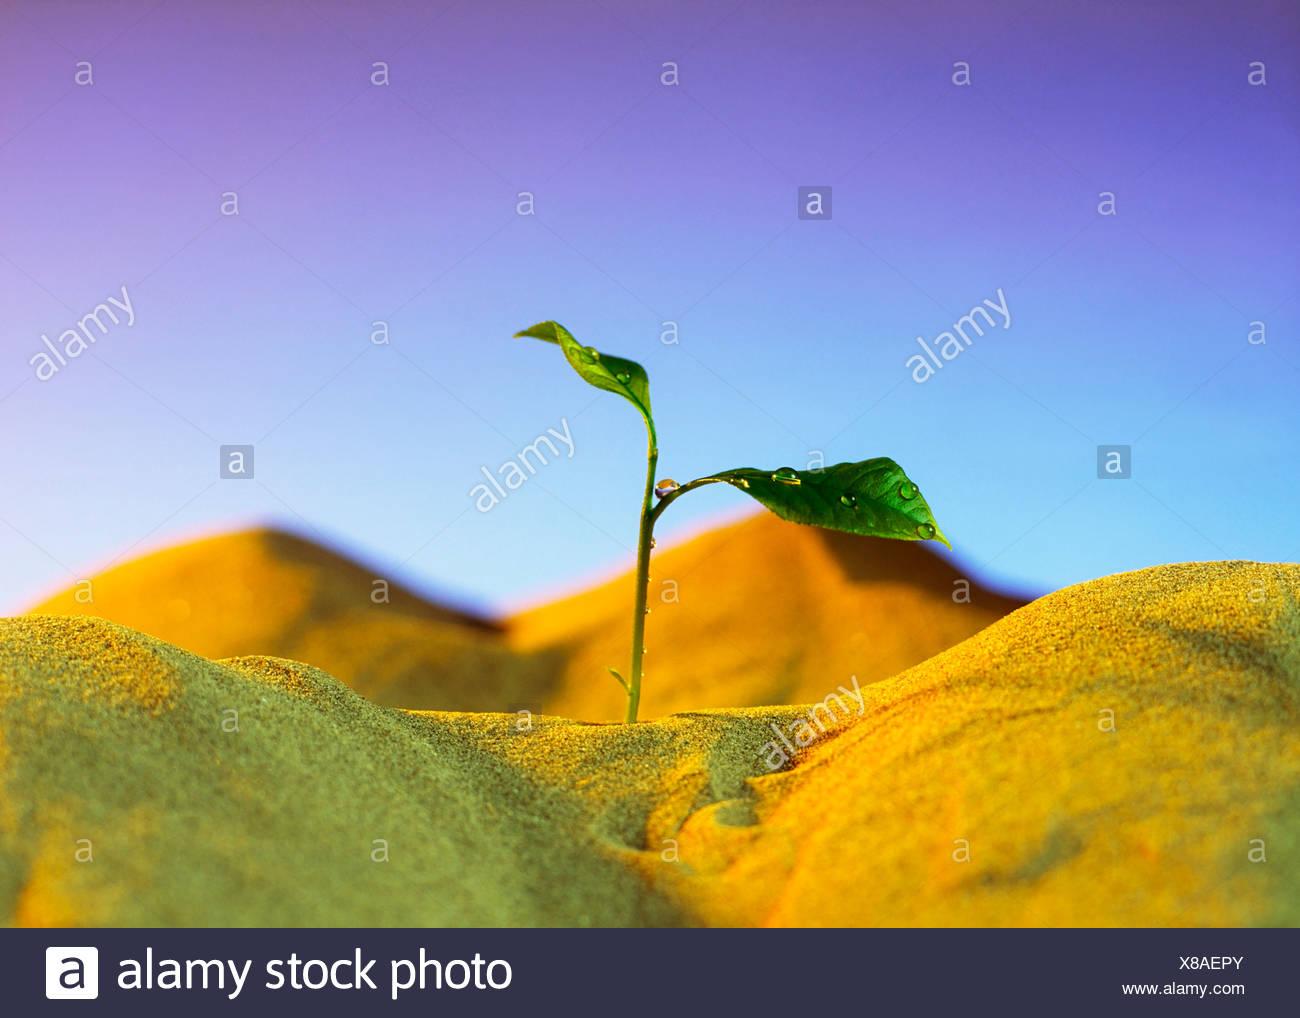 Landwirtschaft, Sämling Stockbild